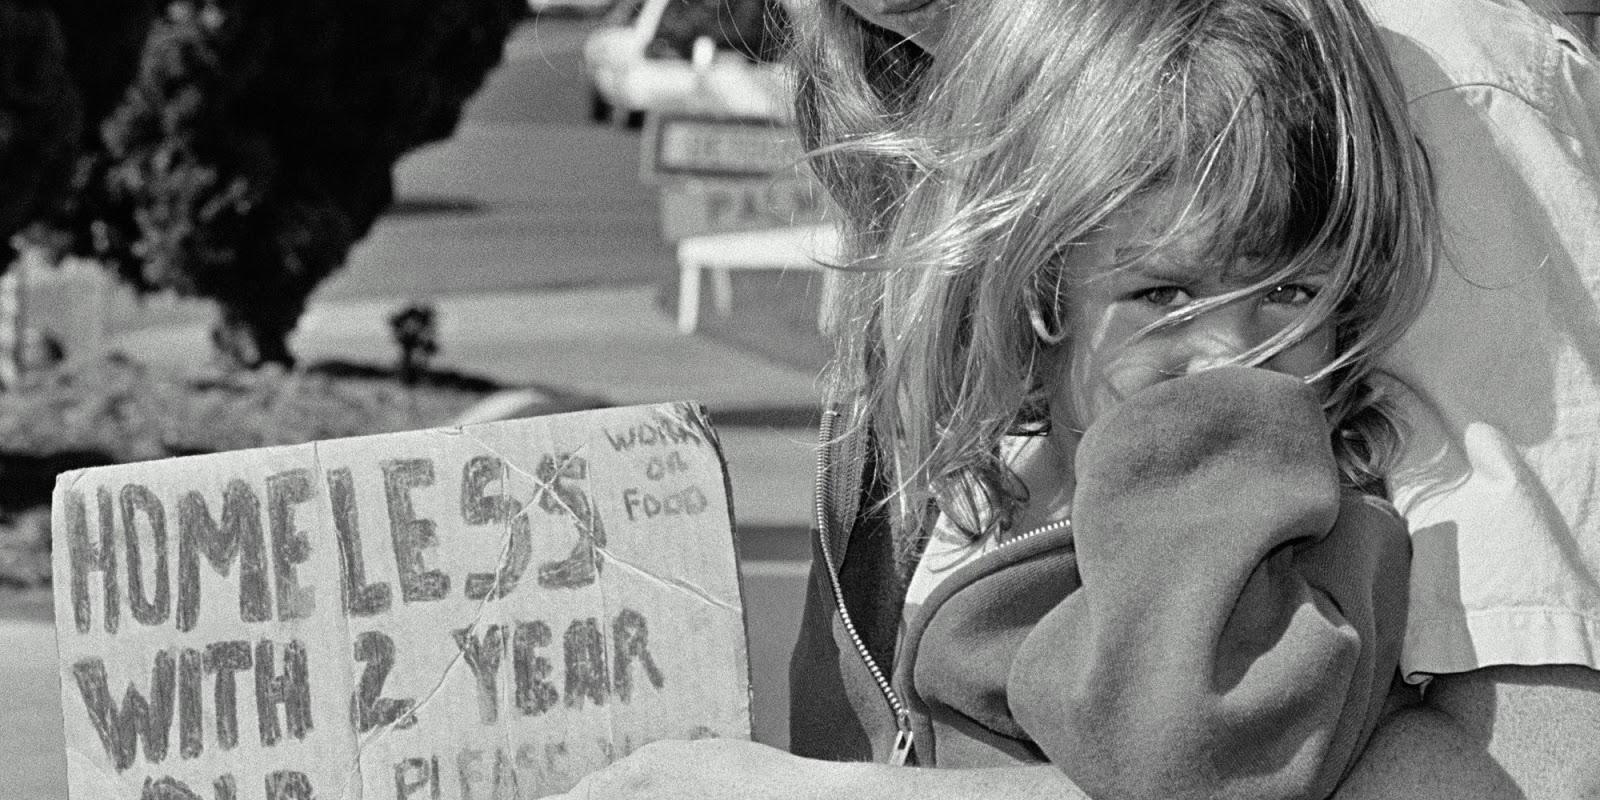 essays on homelessness in america